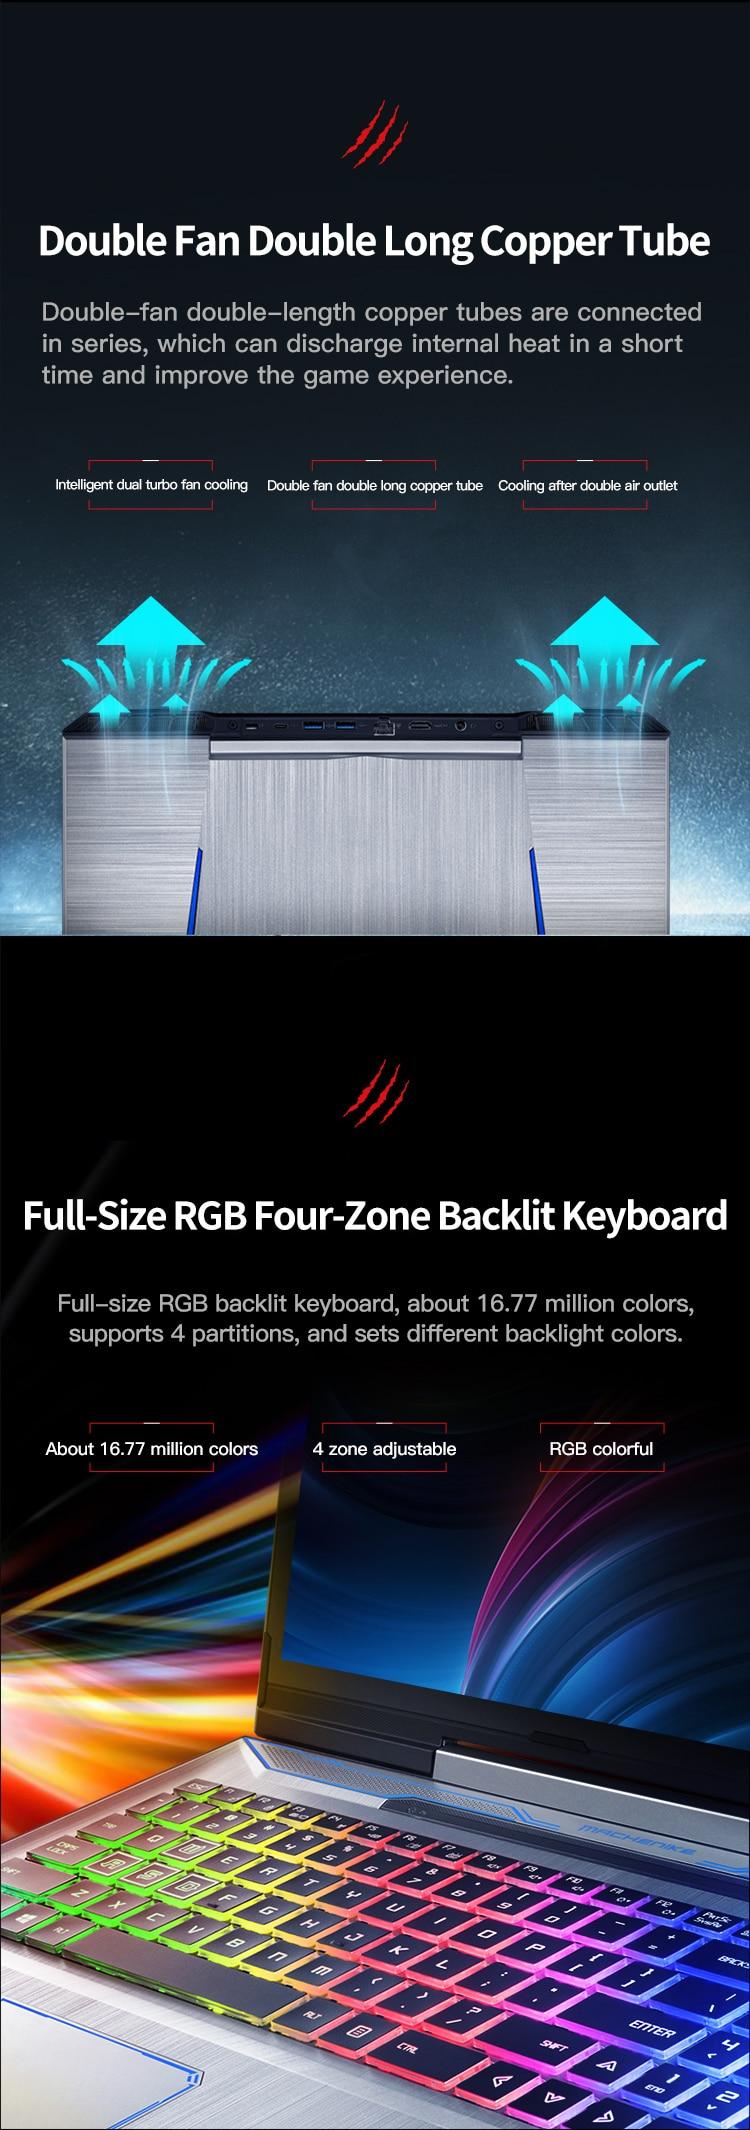 H8b5ca9d5900949c8bdb9c14ff97539cea Machenike T90-T6C Gaming Laptop (Intel Core i7-8750H+GTX 1060 6G/8GB RAM/256G SSD/15.6'' 144Hz72%NTSC) Machenike-brande notebook